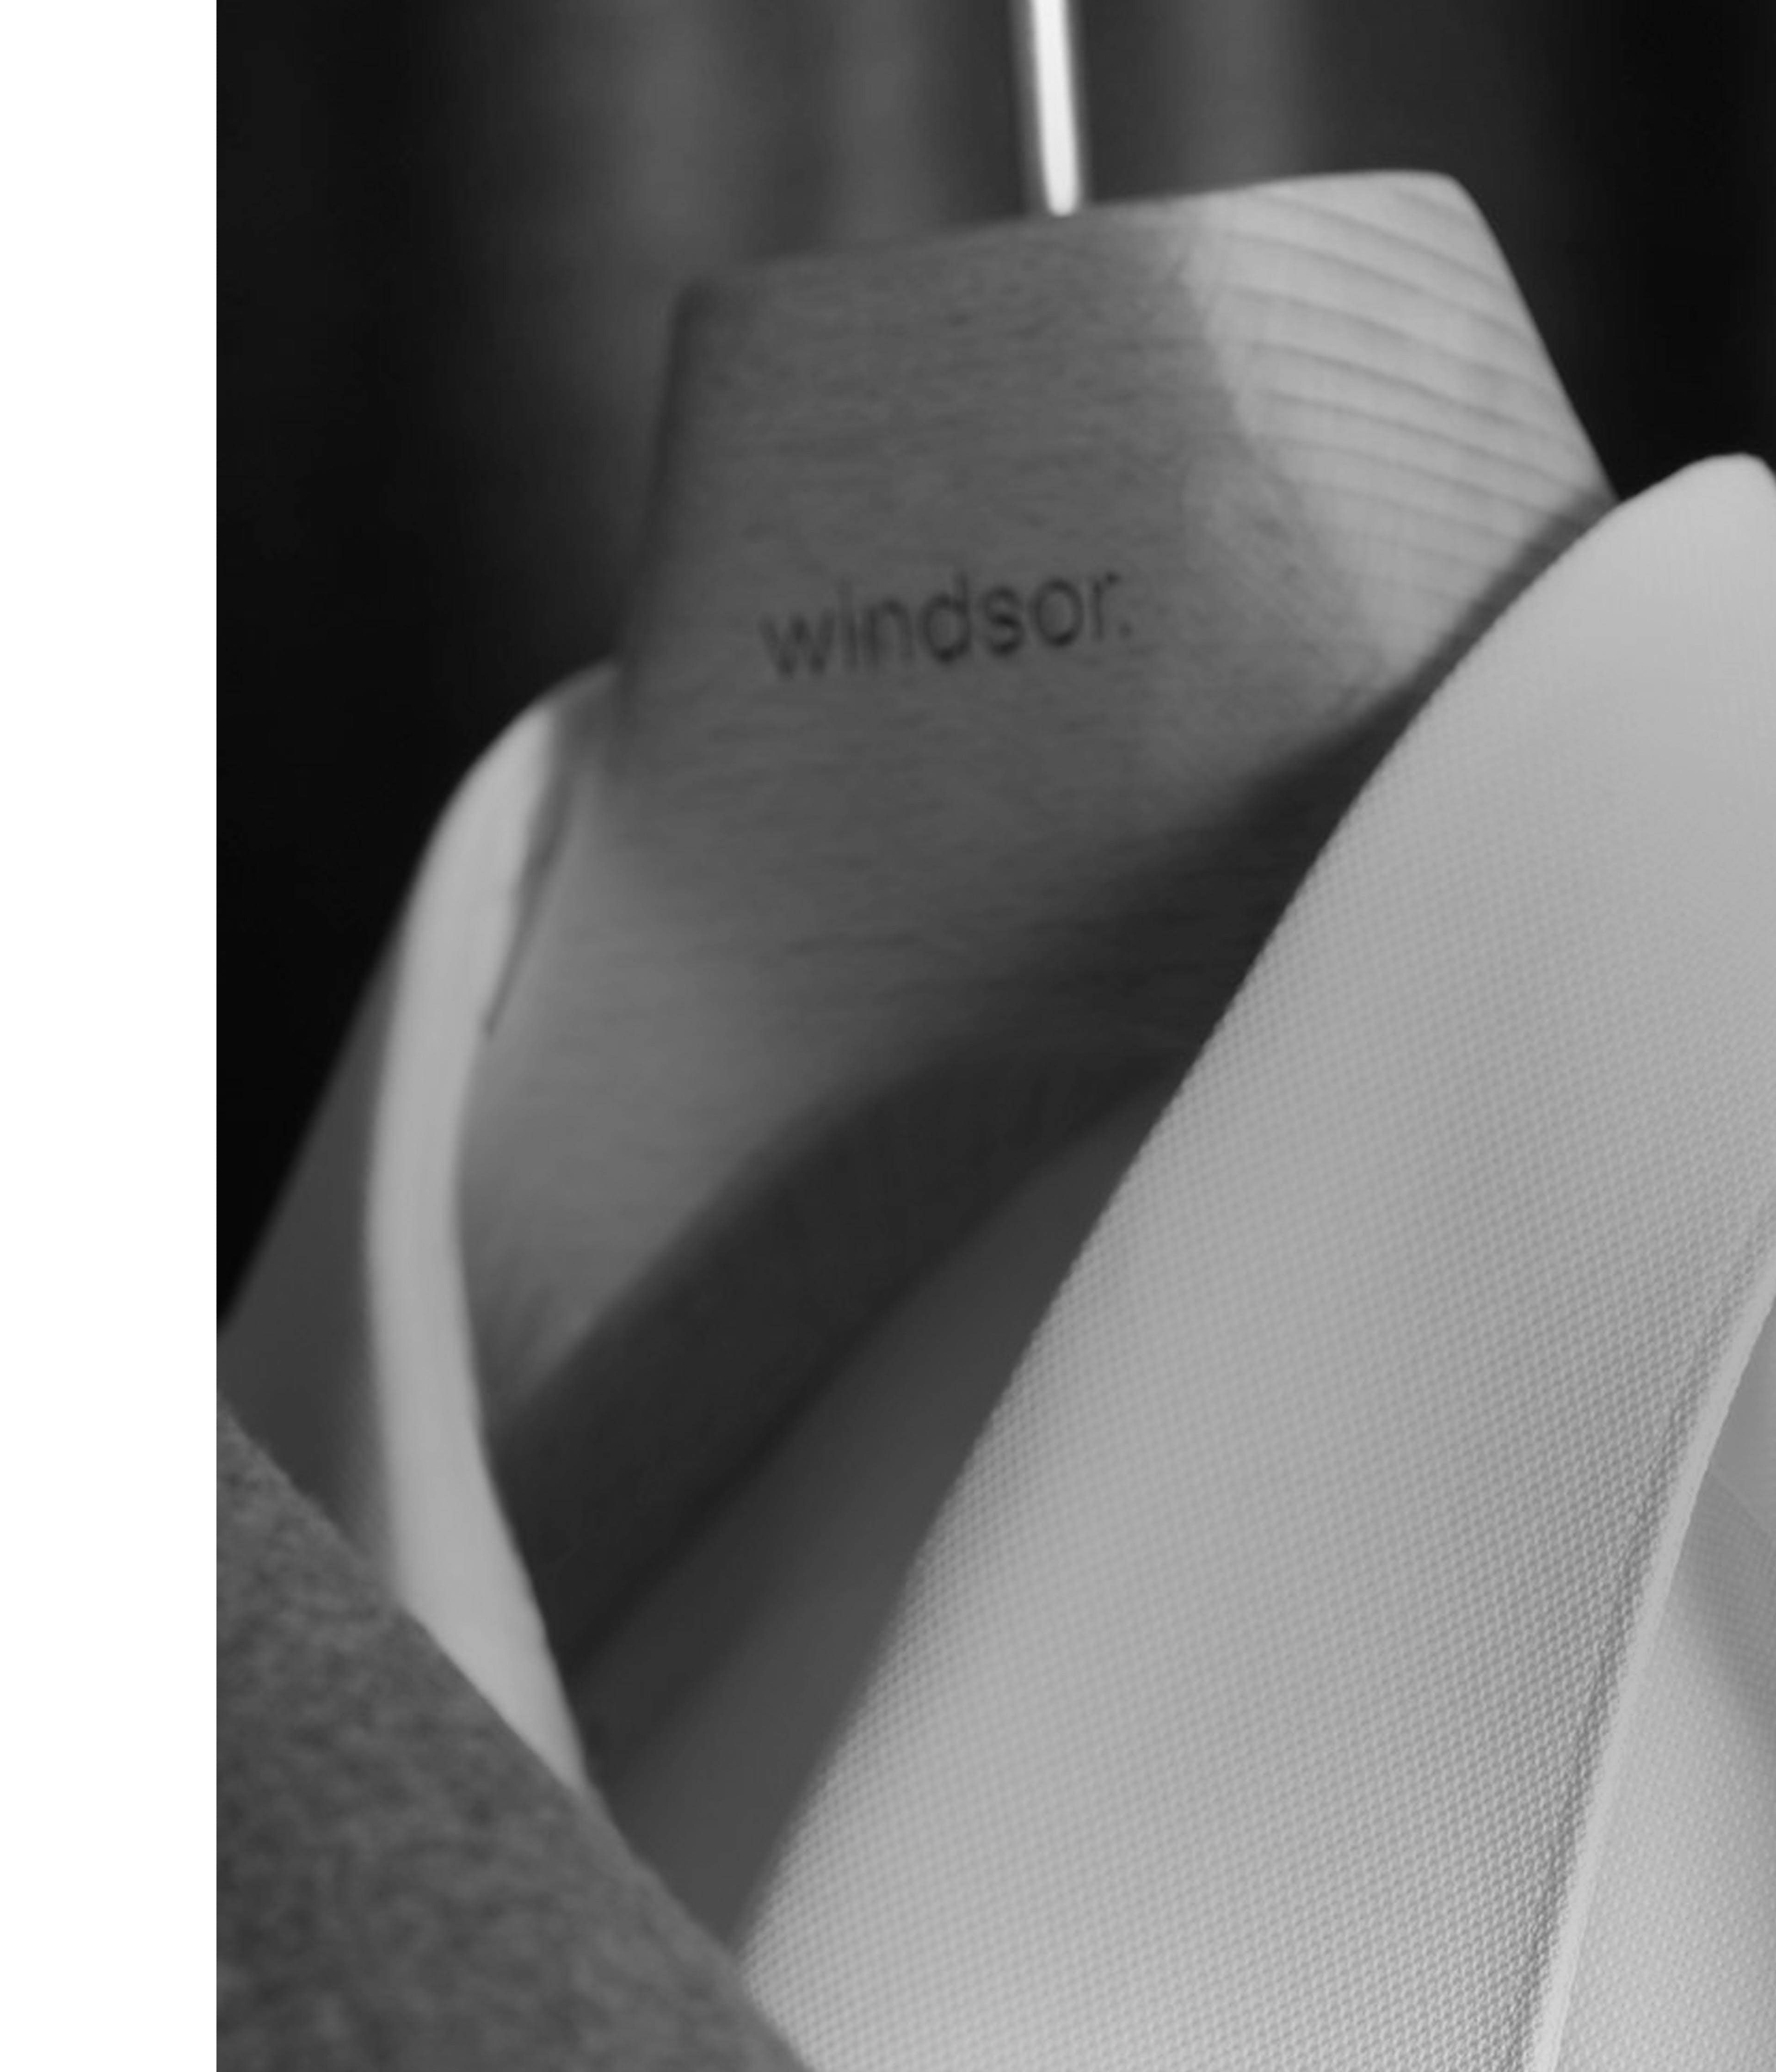 windsor. History